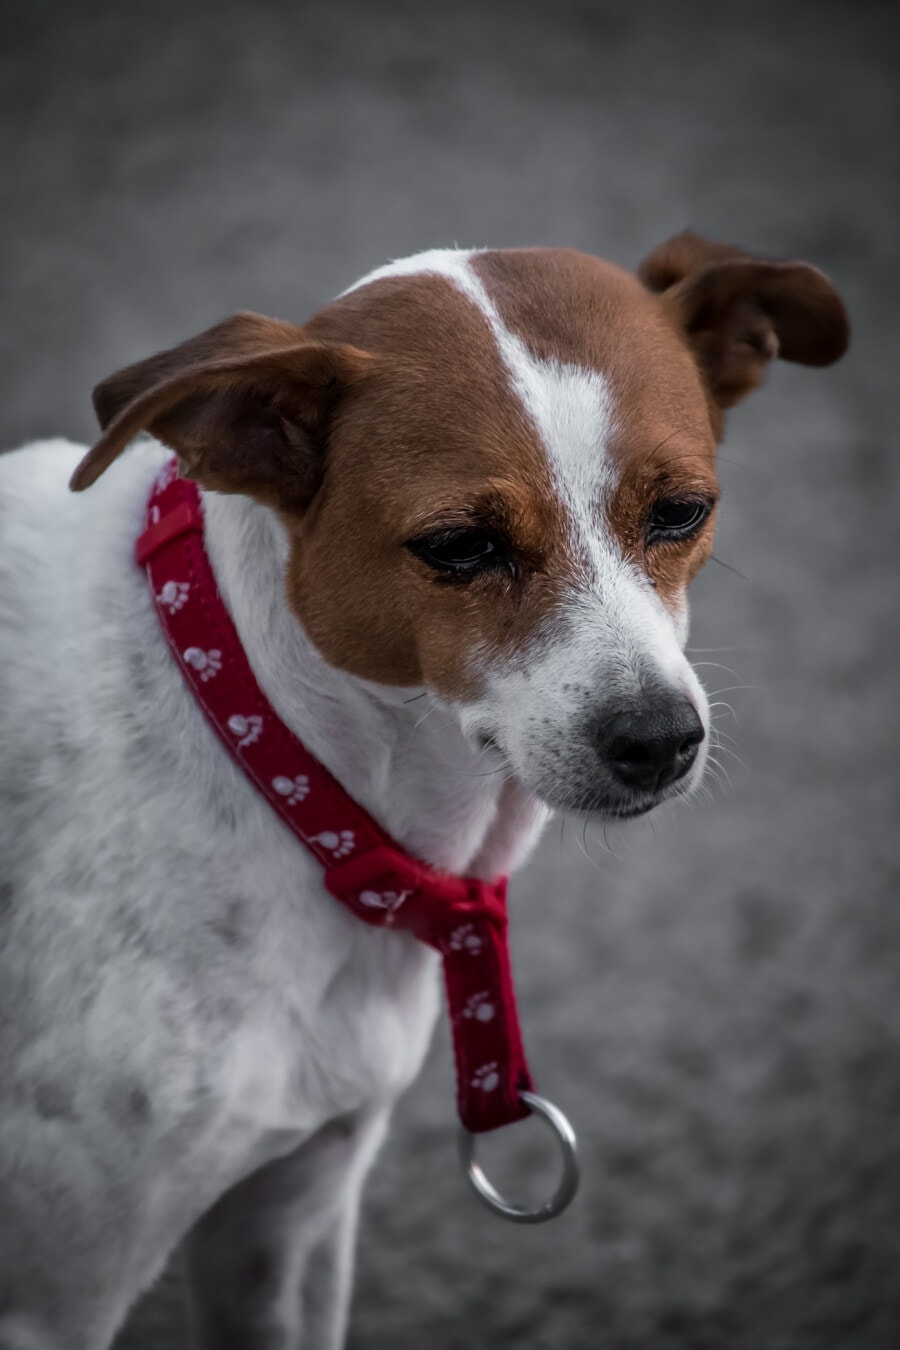 white, light brown, dog, small, reddish, collar, puppy, pet, funny, animal